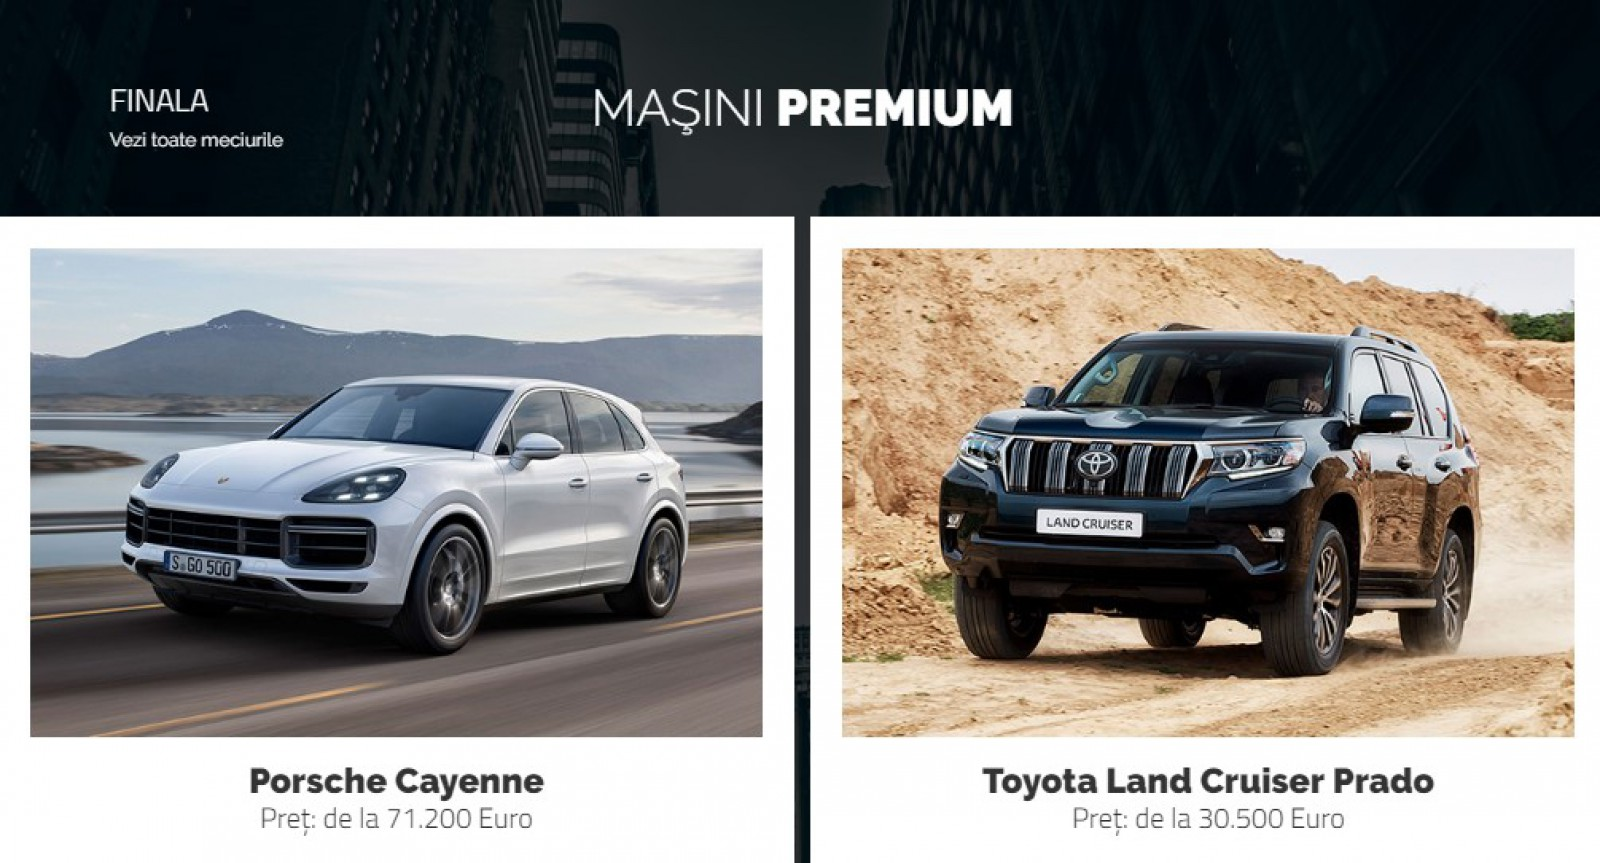 AUTOVOT MOLDOVA 2018! Finala mică din categoria Maşini Premium: Porsche Cayenne vs Toyota LC Prado!